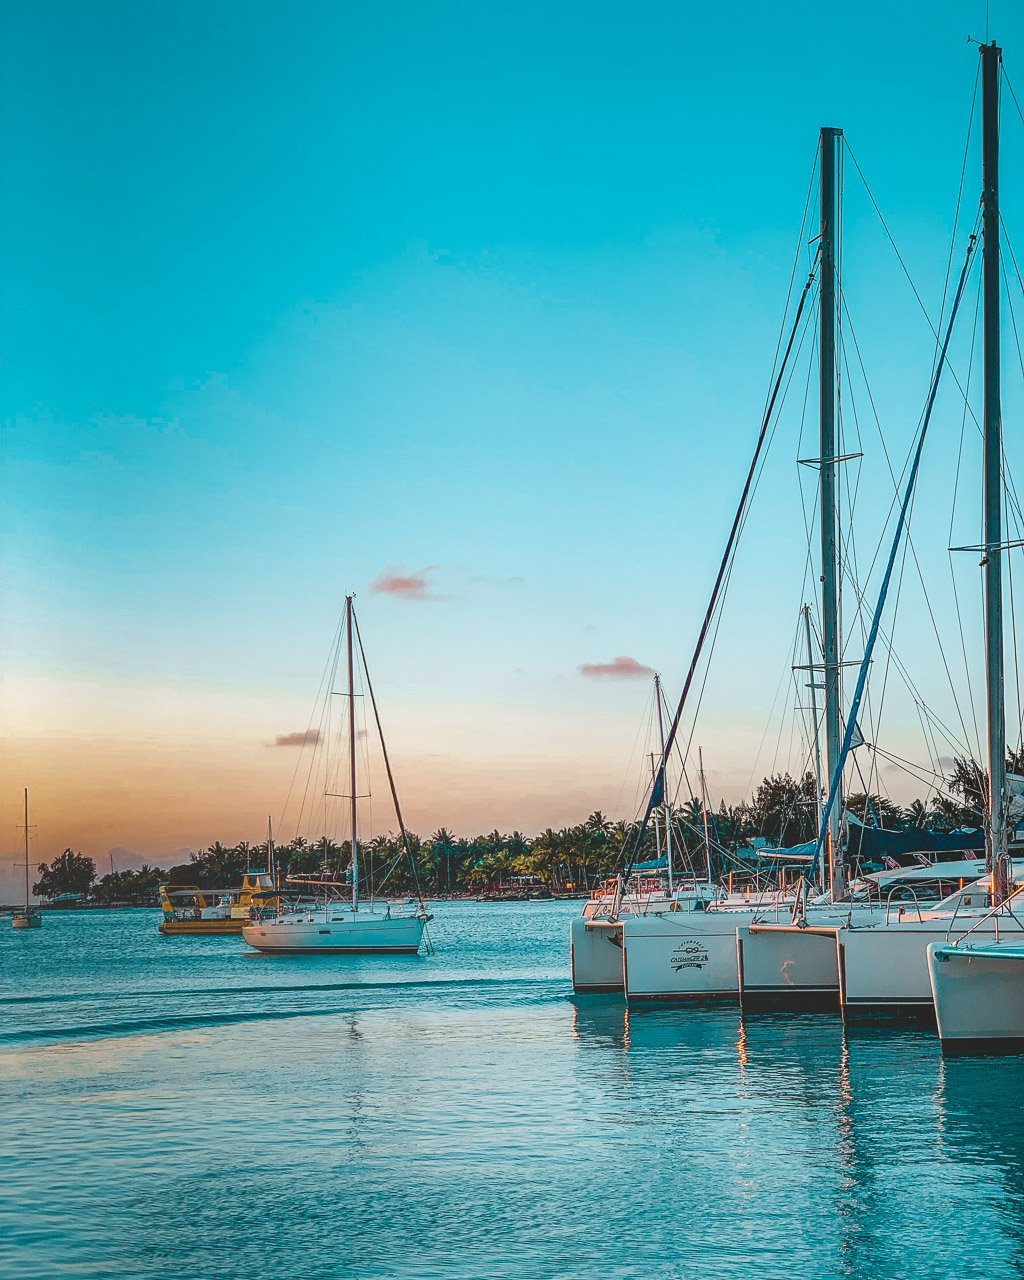 Grand Baie, Grand baie Mauritius, Mauritius sailing, Mauritius sunset